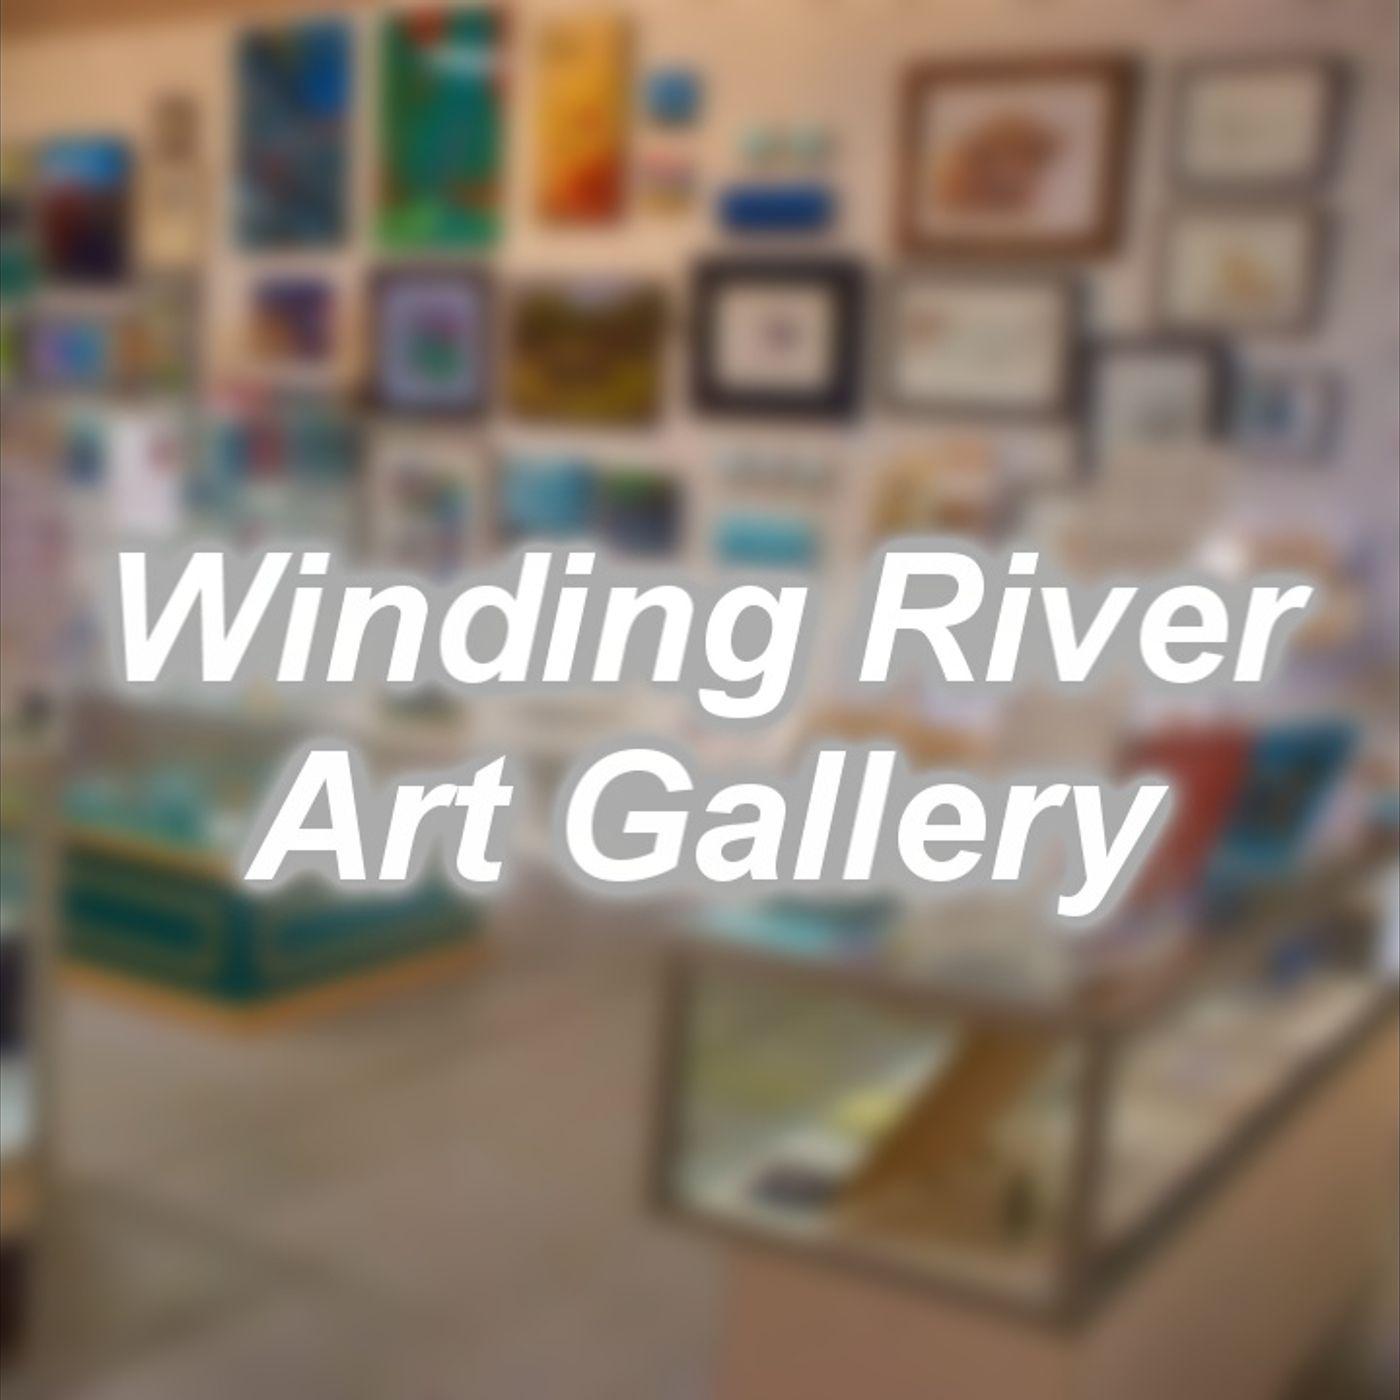 Winding River Art Gallery